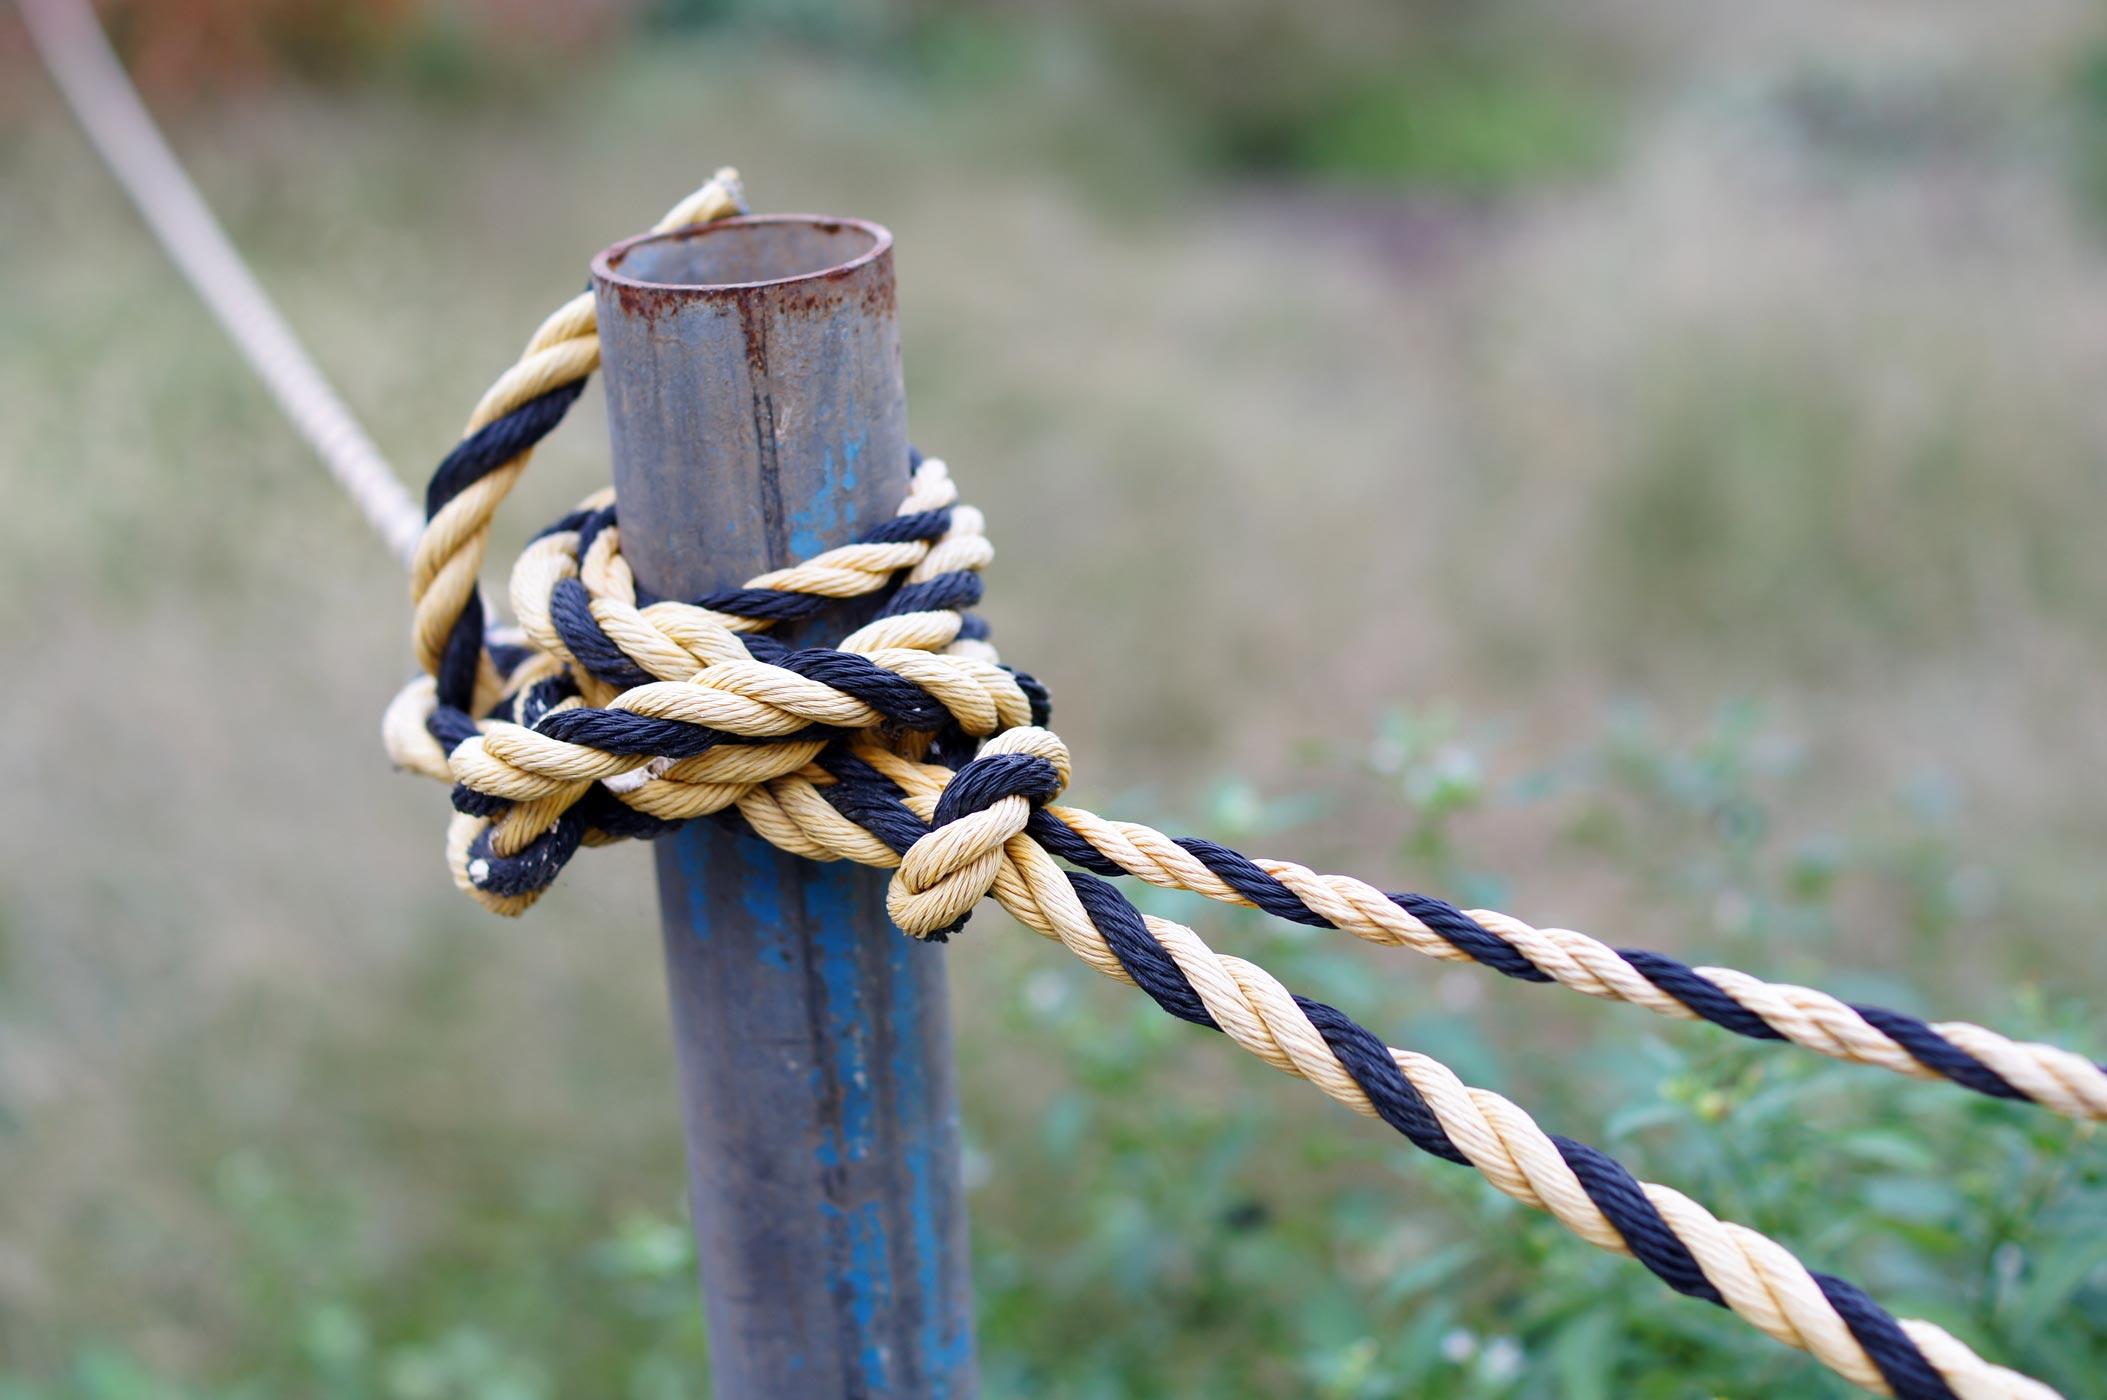 rope_e0216133_2319128.jpg